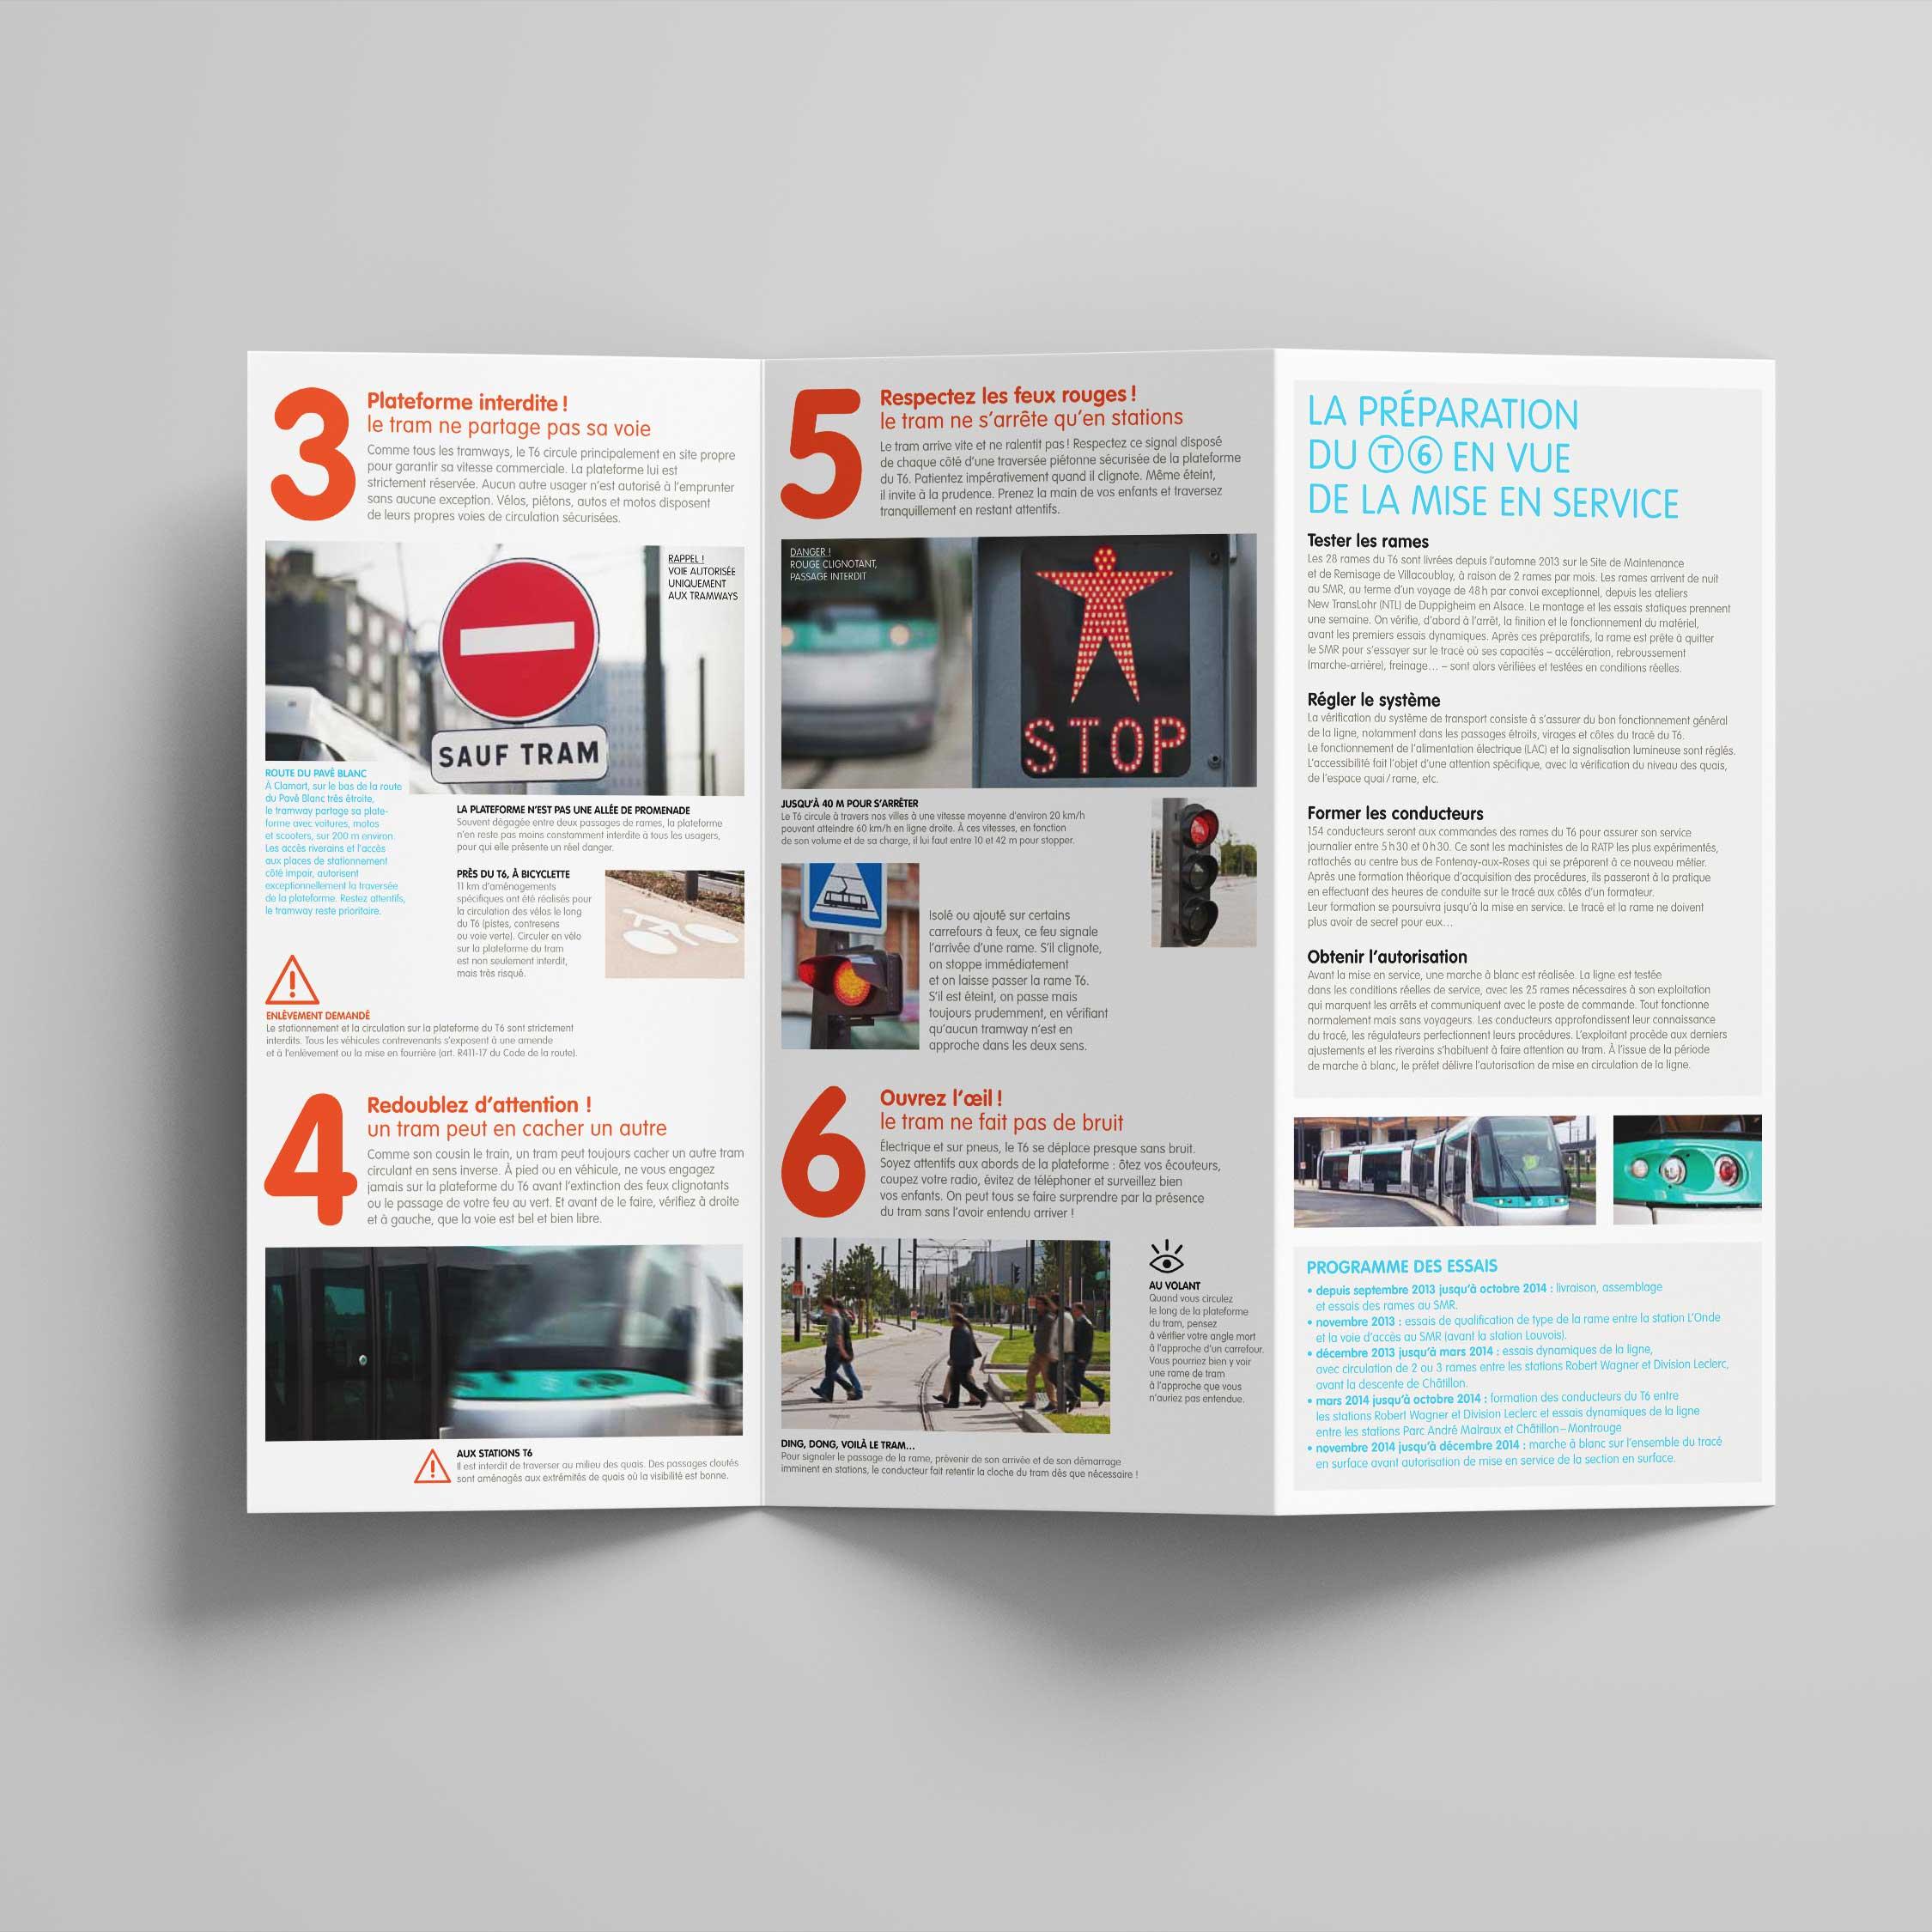 Ratp Tramway Deplacement Code Securite Ville Brochure Information